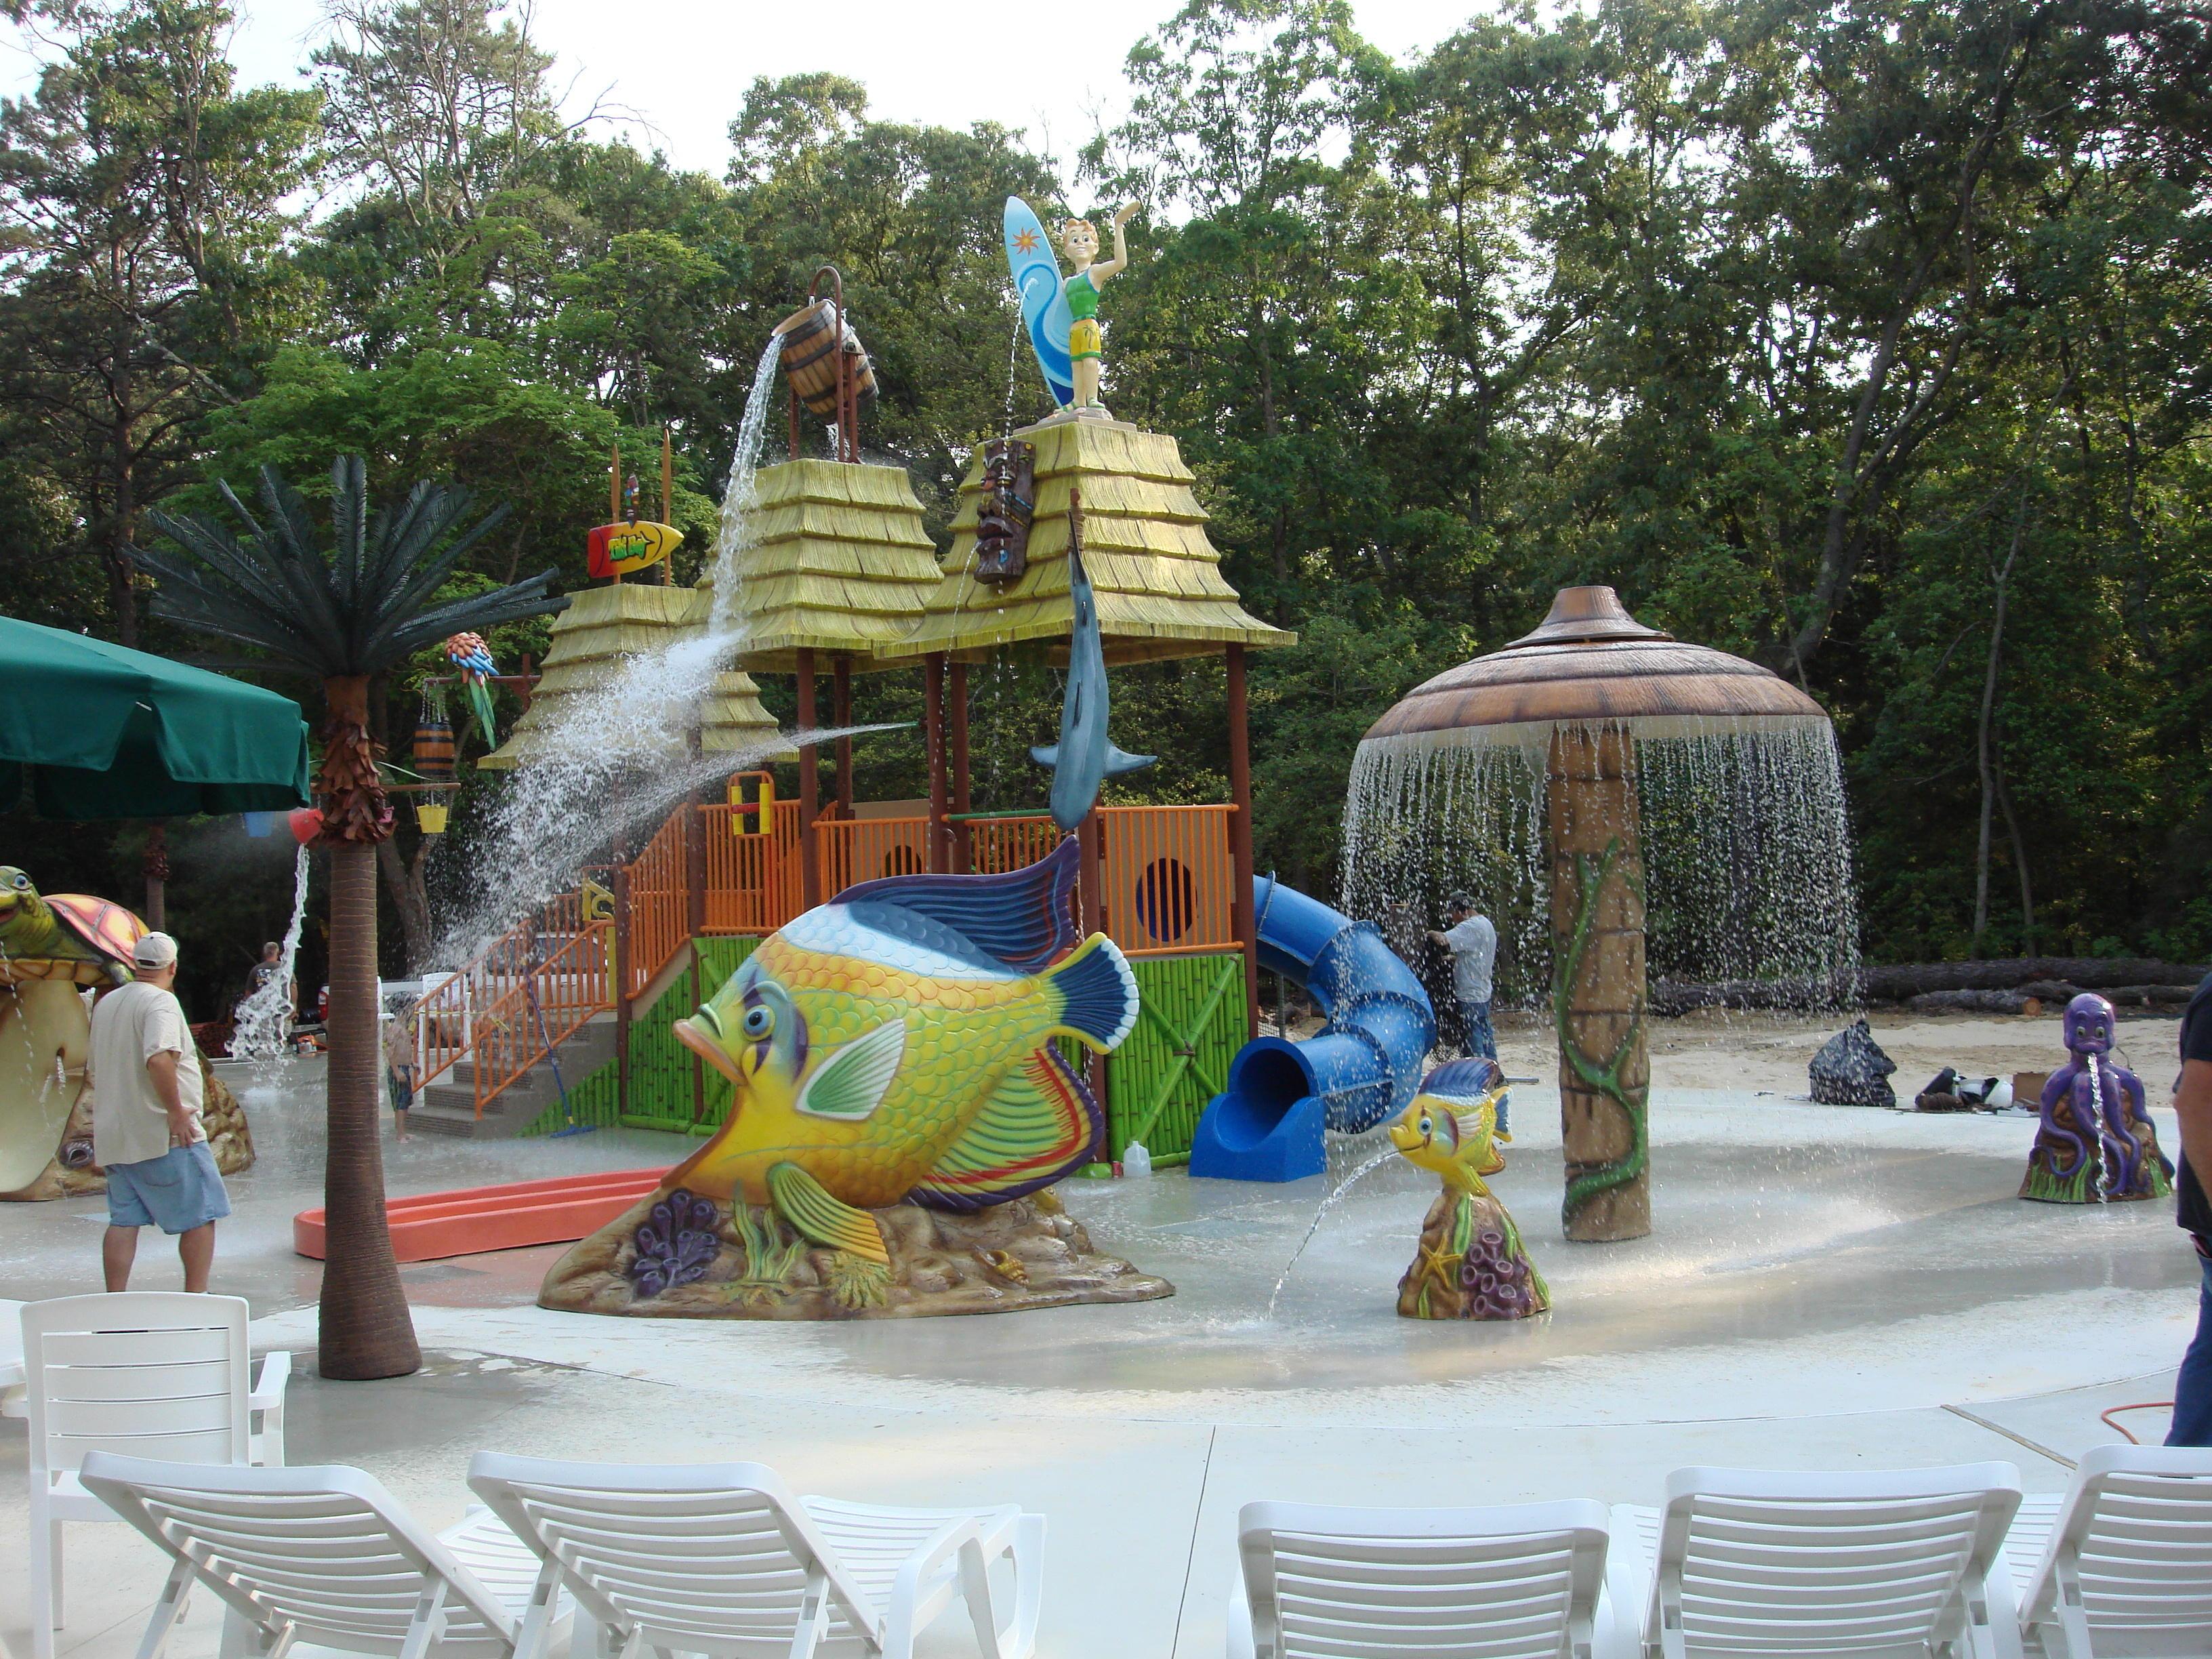 Adventure Playground Systems image 5